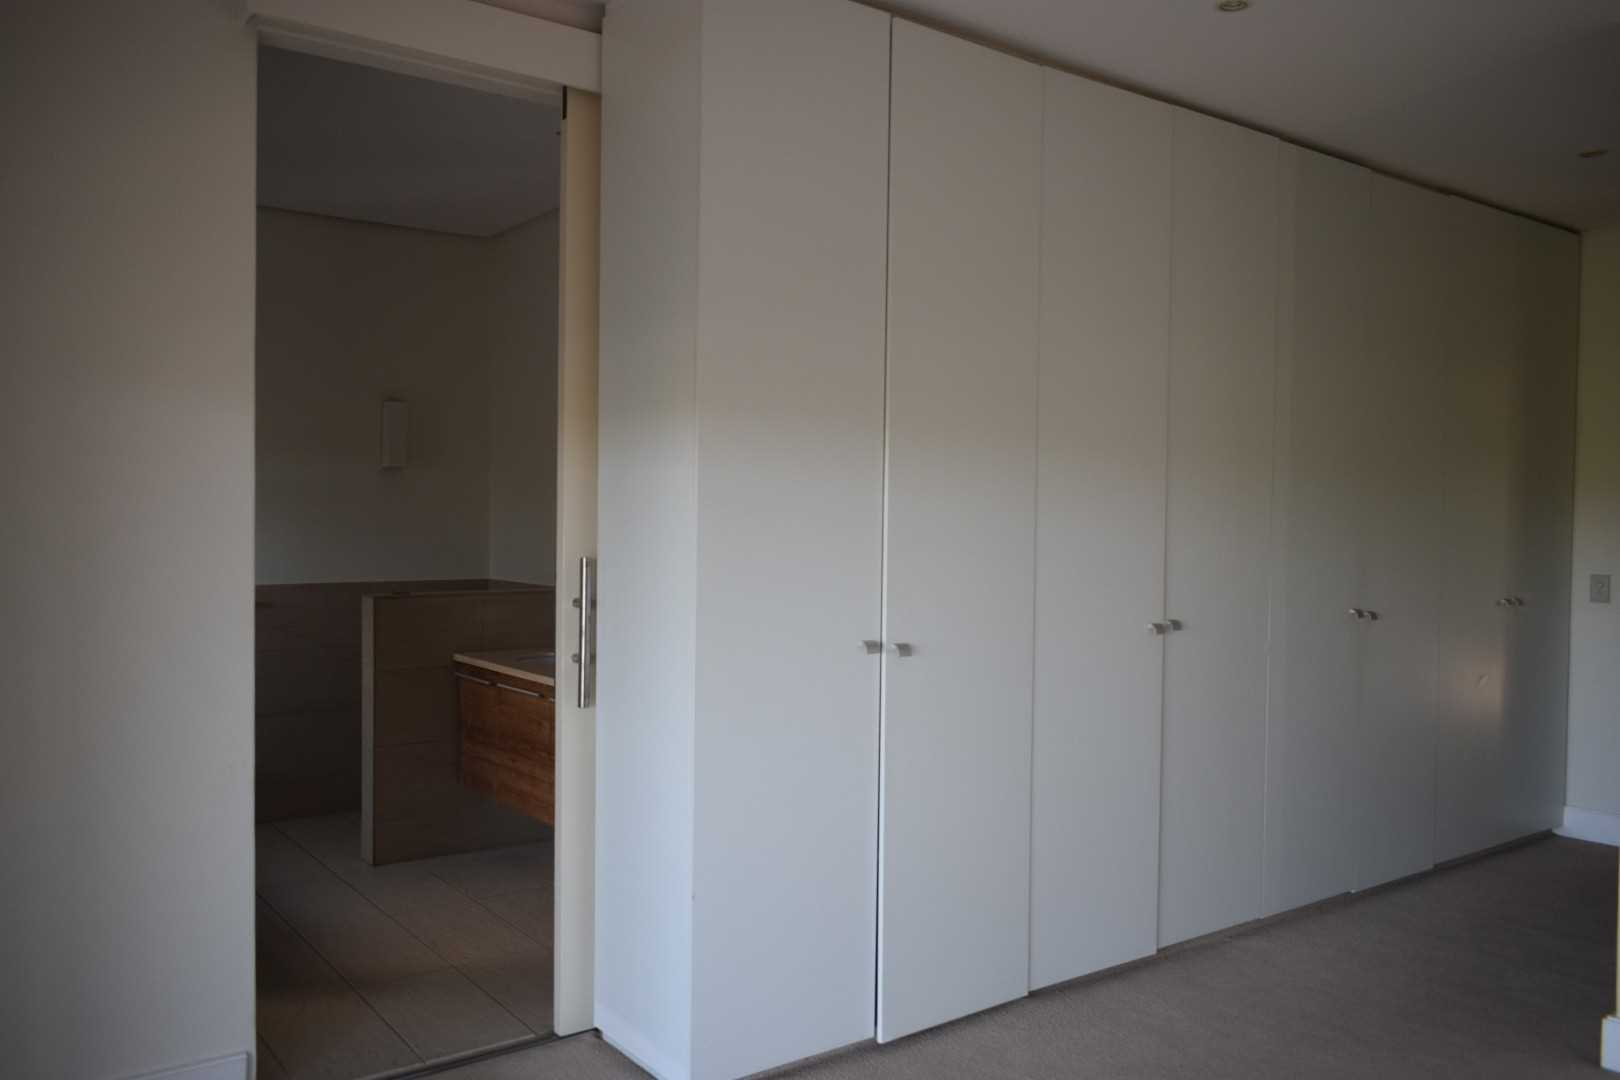 Master bedroom bathroom/shower and storage